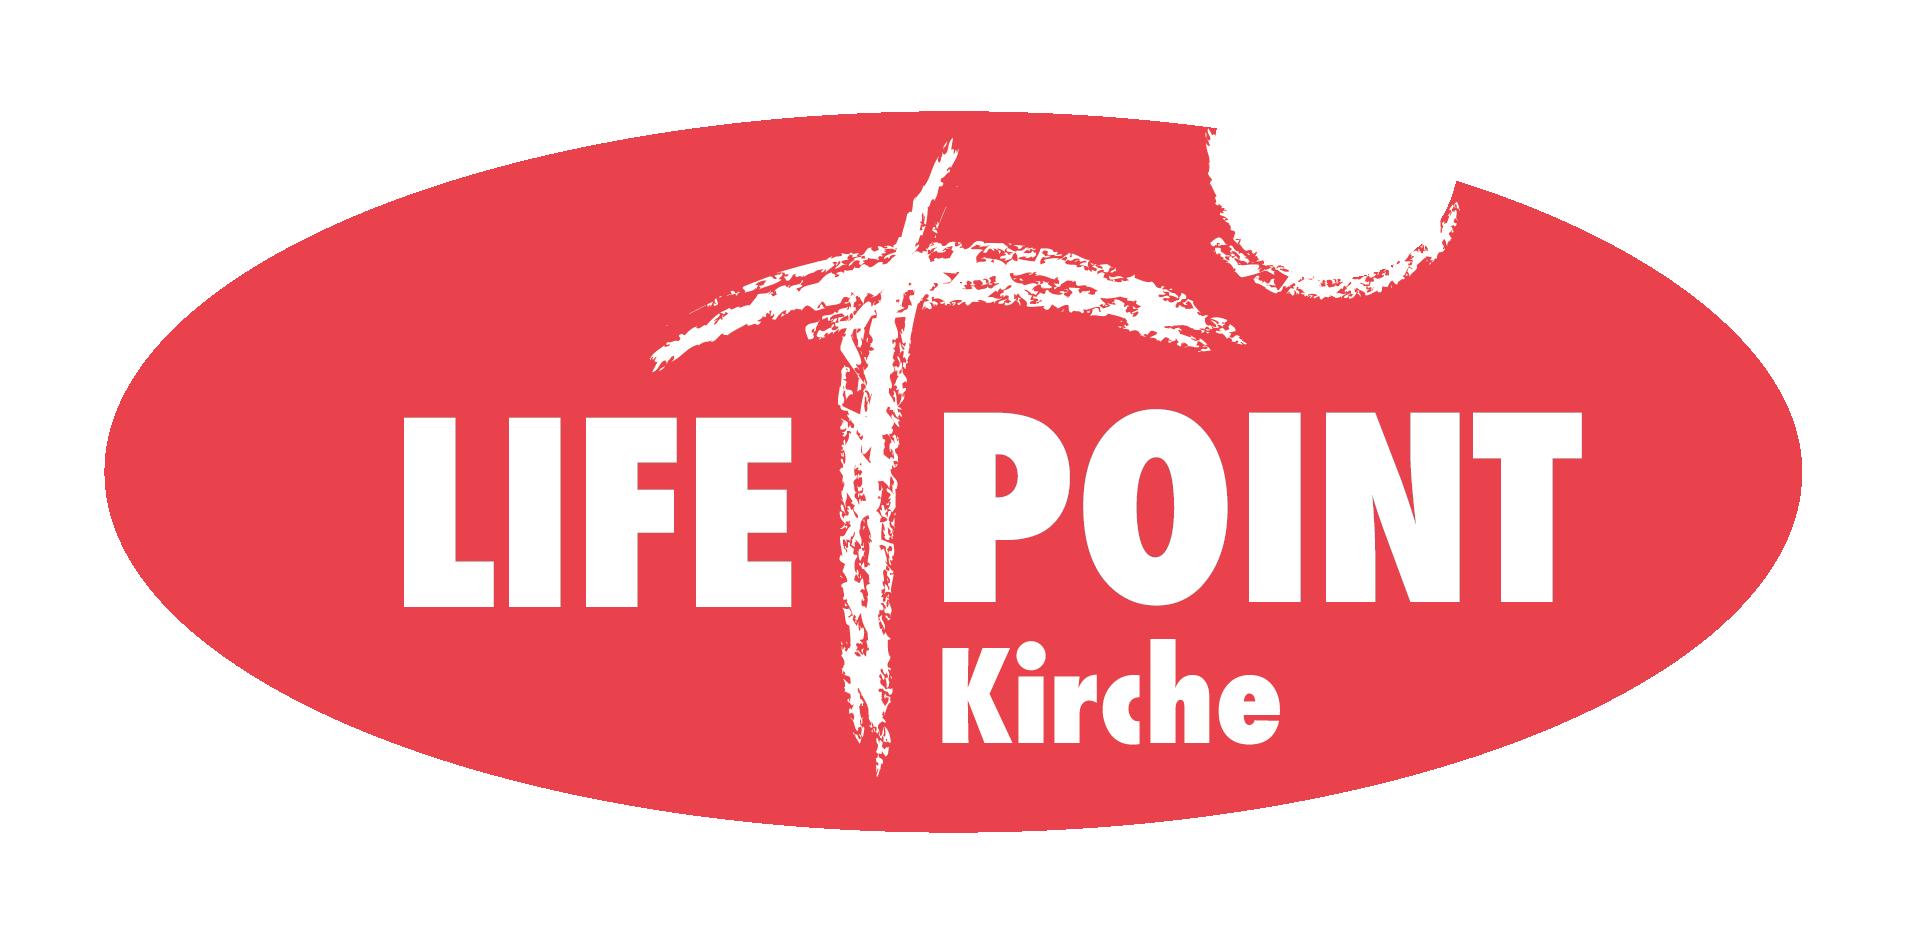 lifepointkirche